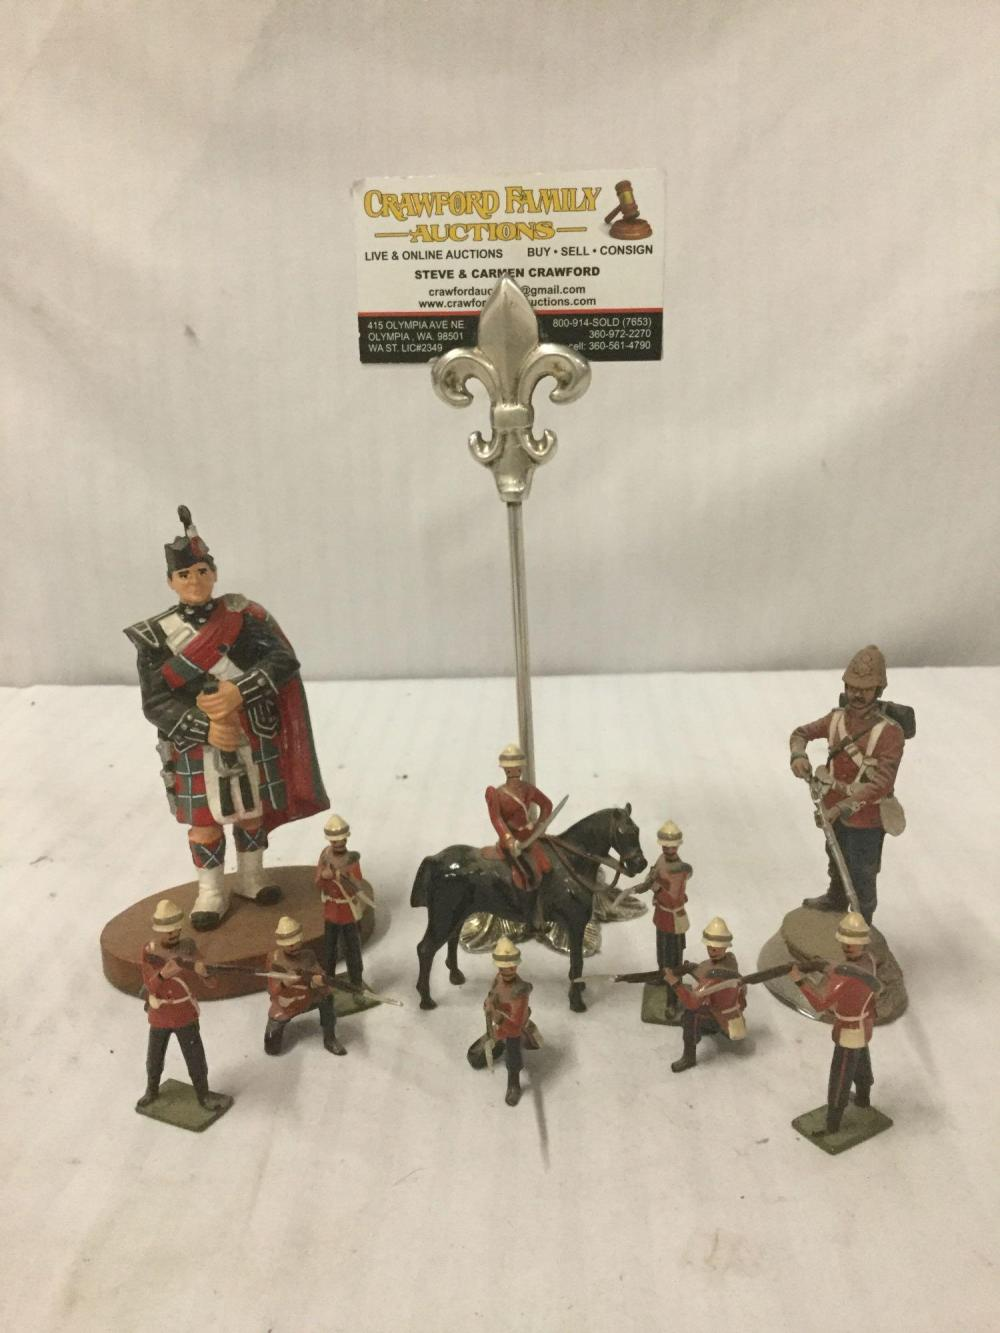 Lot 215: 10 antique painted toy soldiers- 8 are vintage Wm. Hocker Pieces, one Scottish Soldier & one British